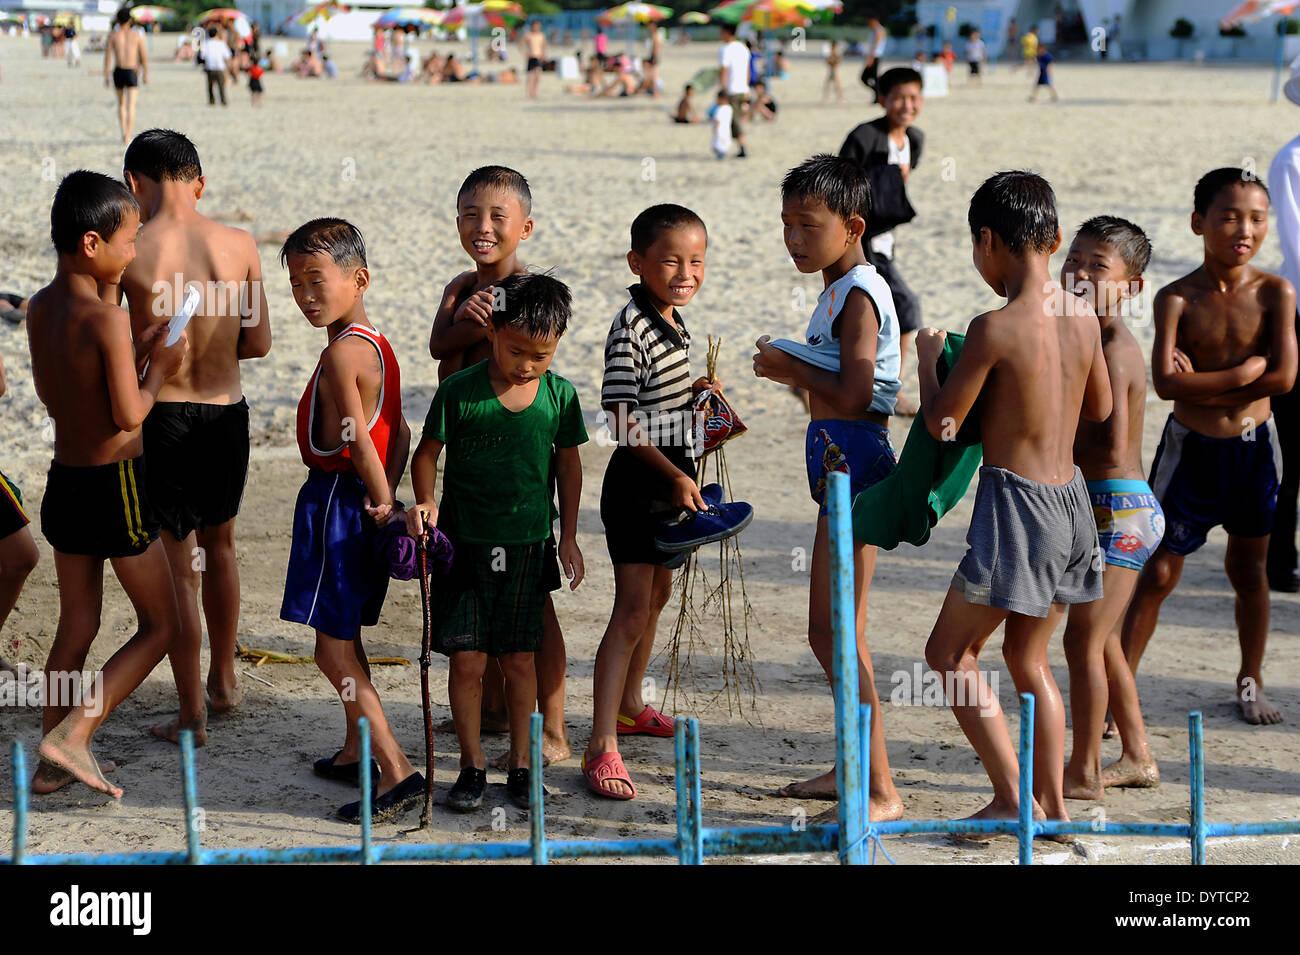 Kids on the beach - Stock Image